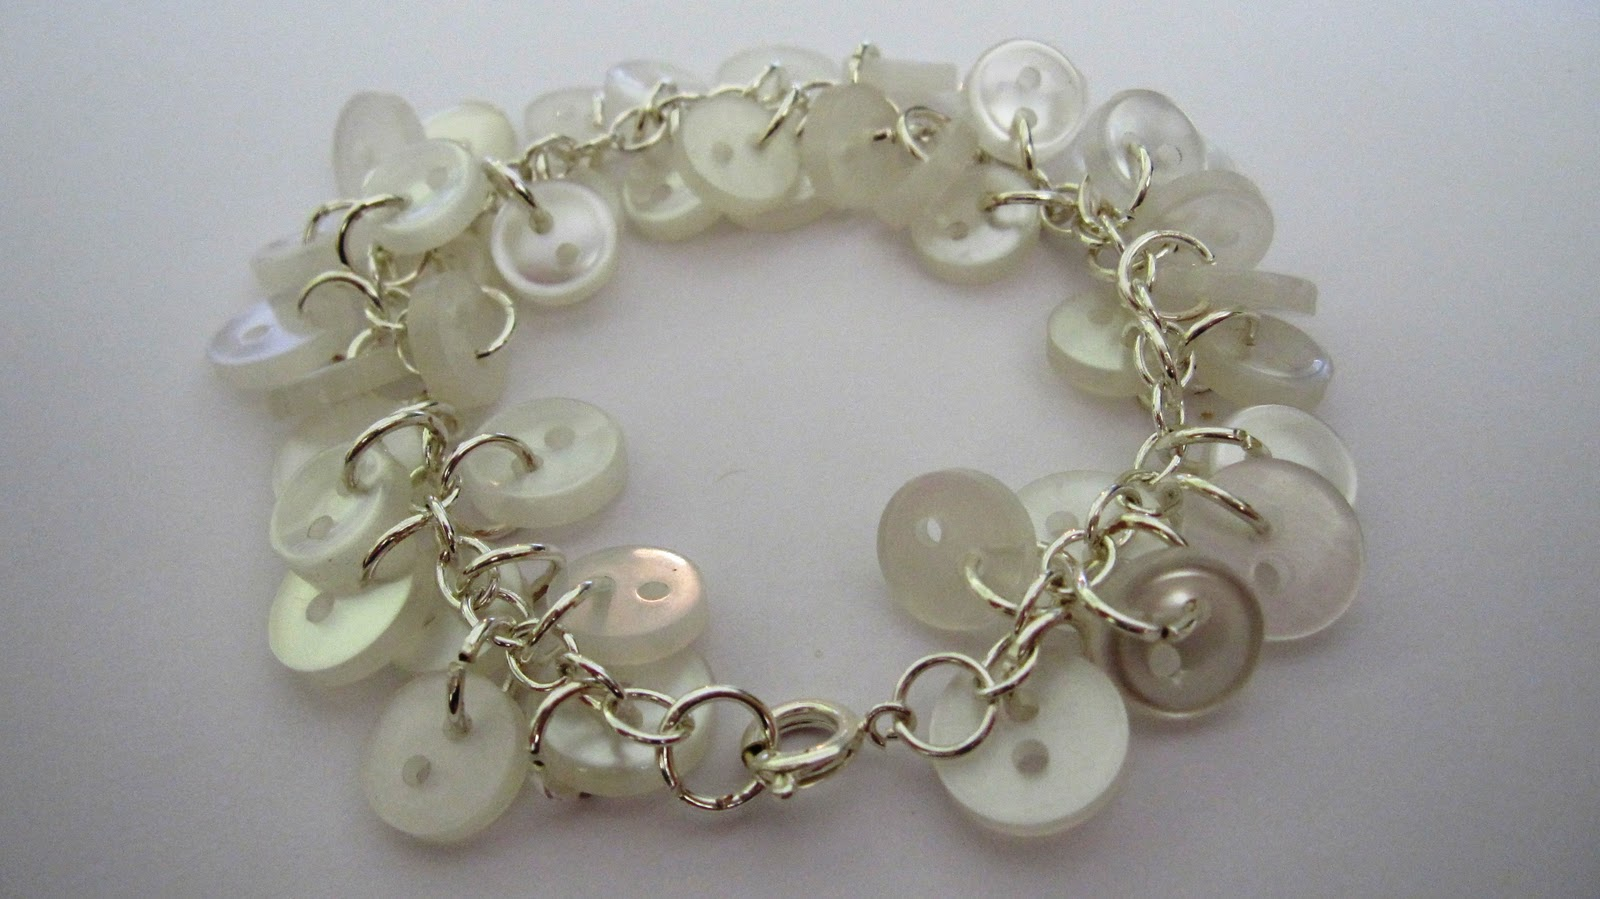 jewelry craft button bracelet frugal york county